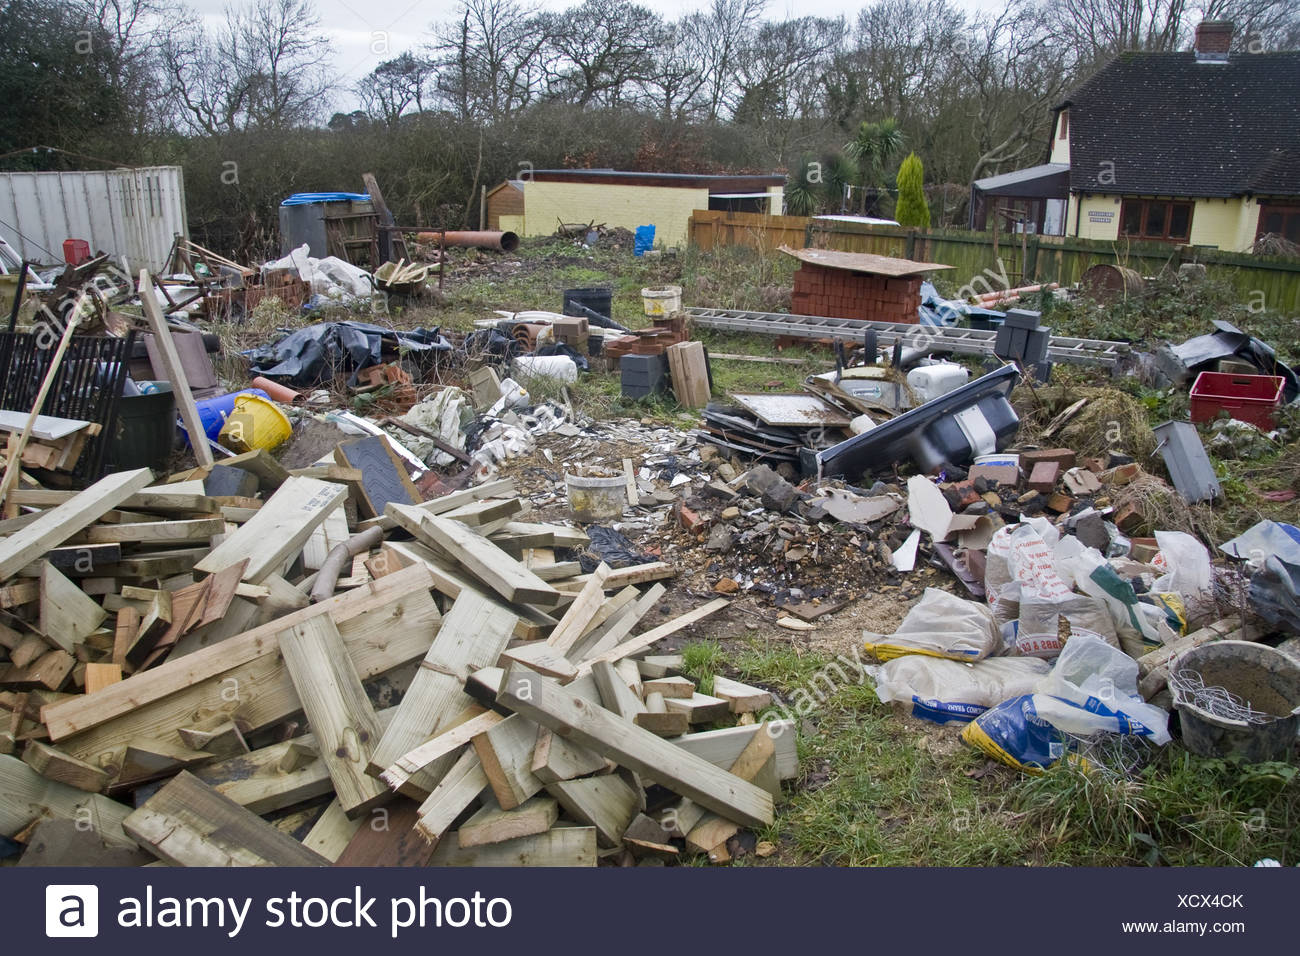 Chaos Untidy Disorganised Mess Lazy Garden Backyard Junk Rubbish Builders  Milford On Sea Hampshire England UK